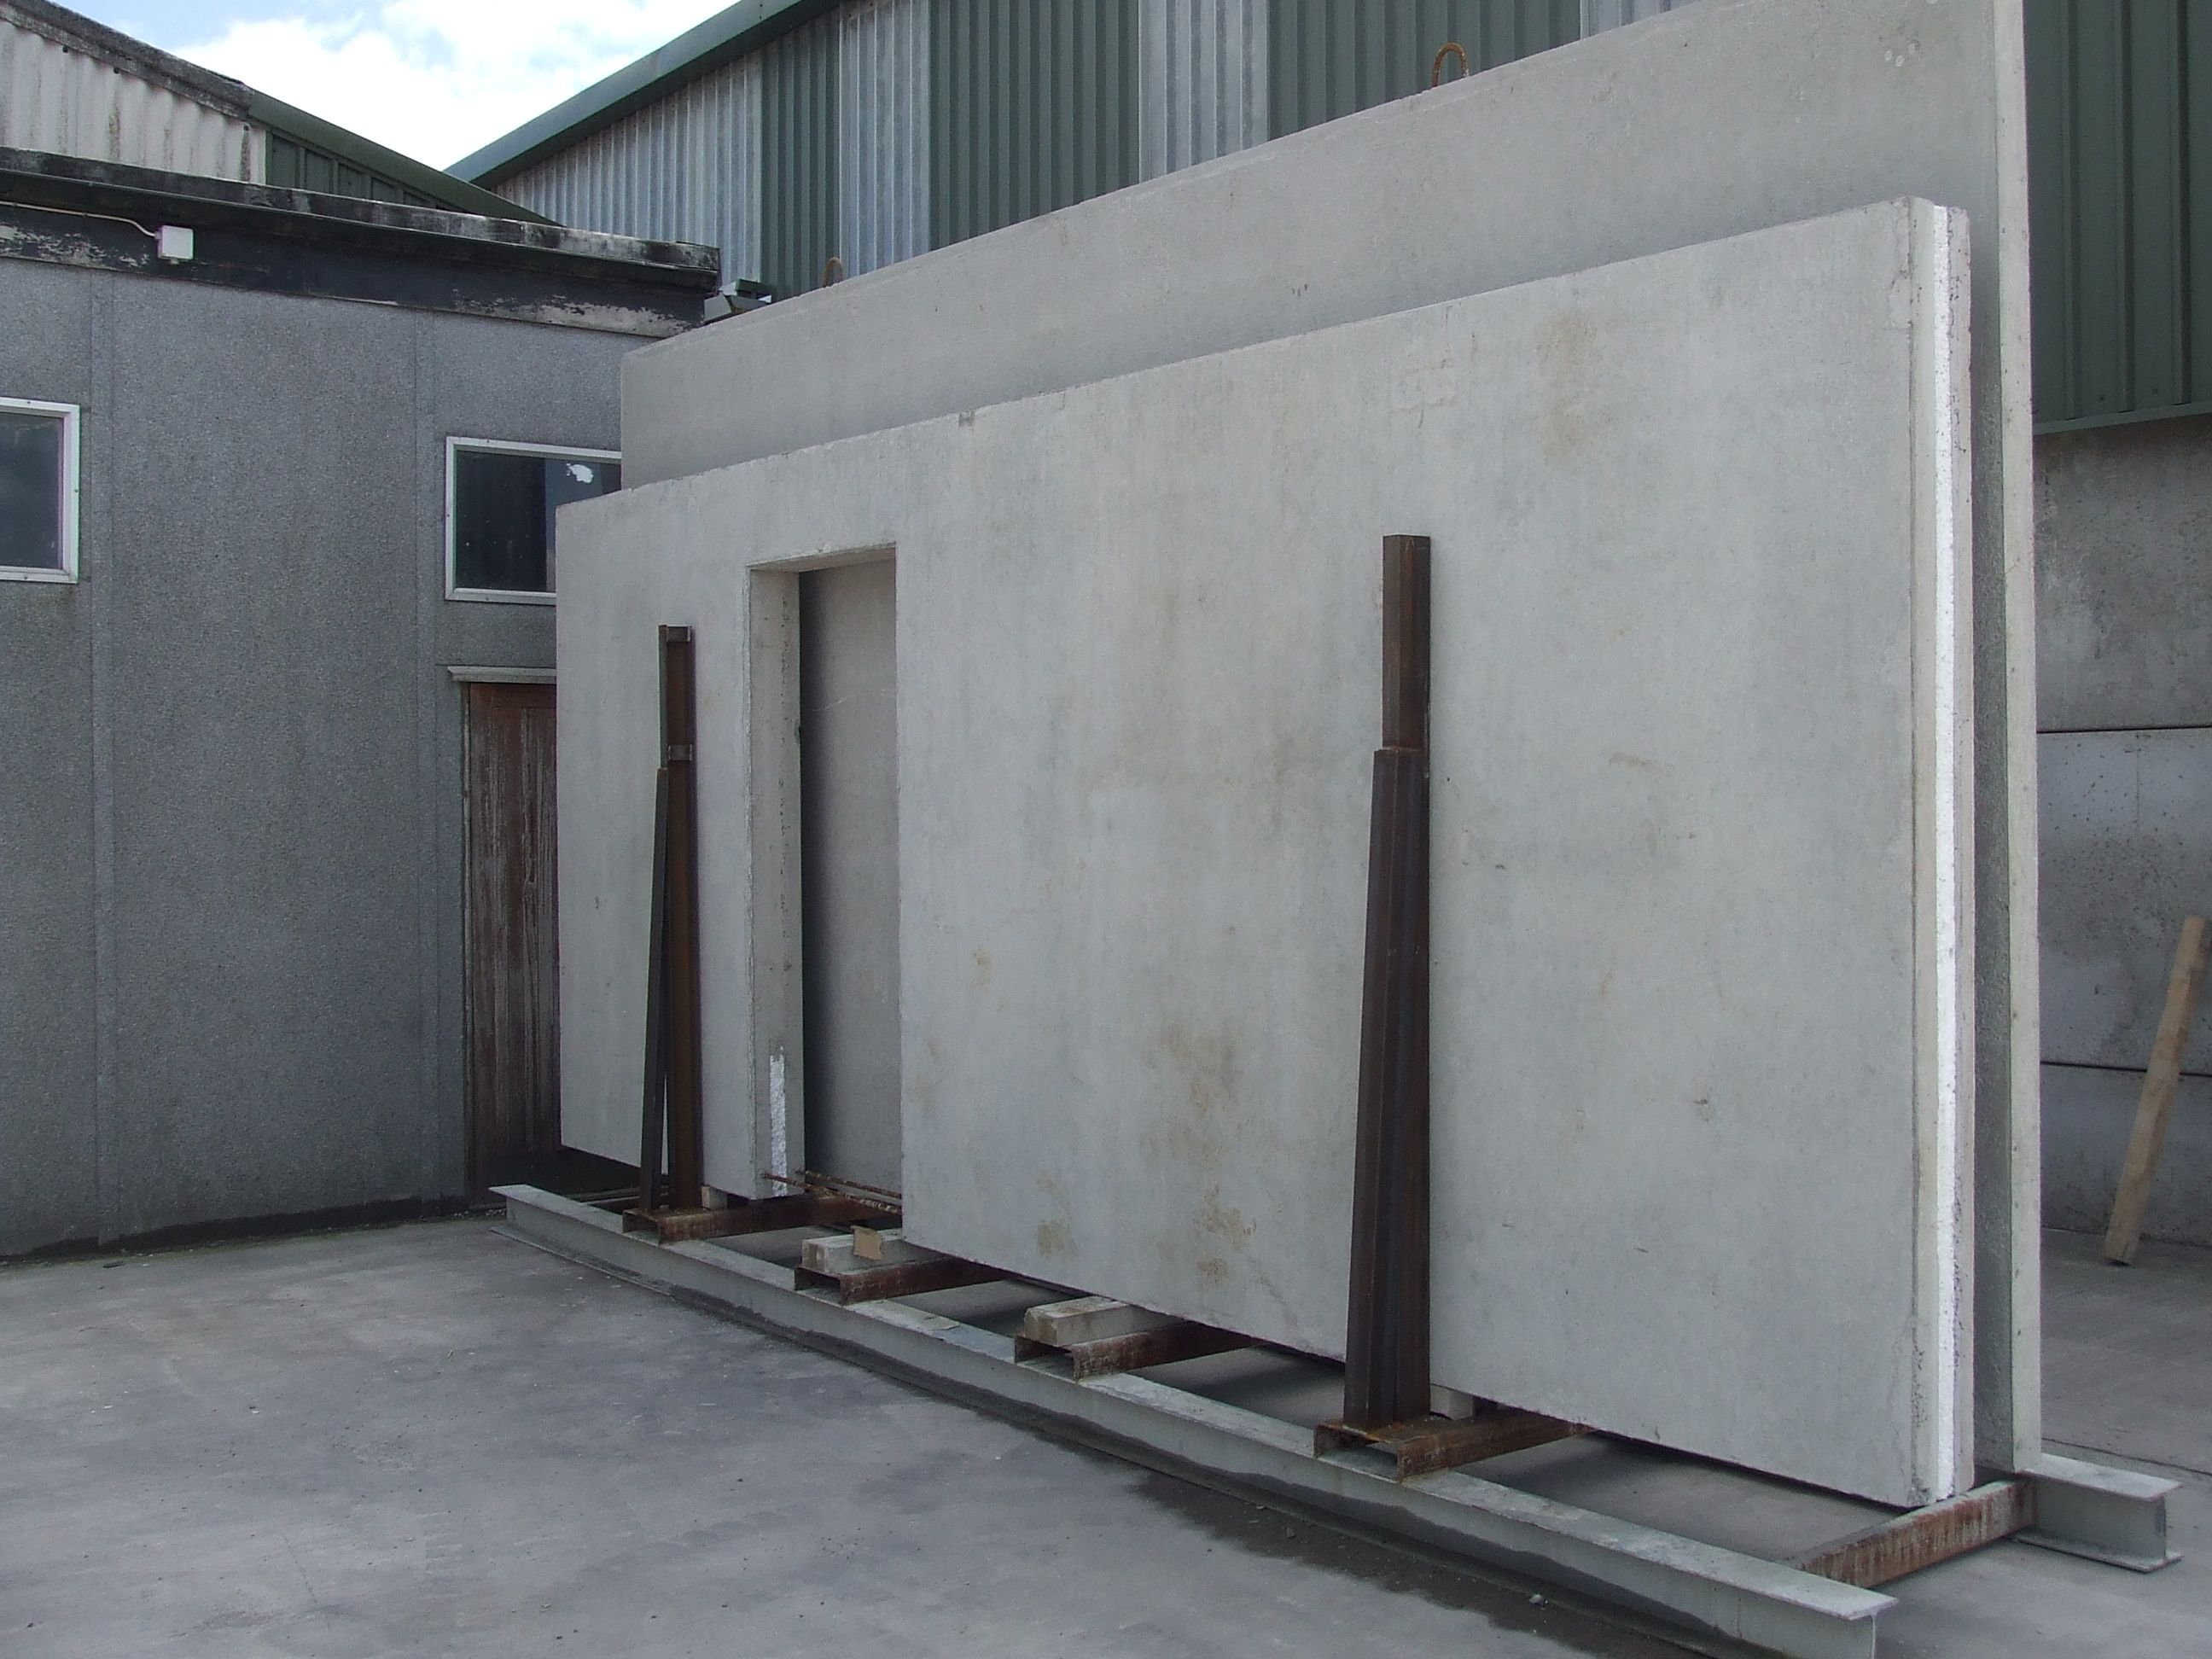 Wall Panels Concrete Wall Panels Precast Wall Panels In 2020 Concrete Wall Panels Concrete Wall Precast Concrete Panels